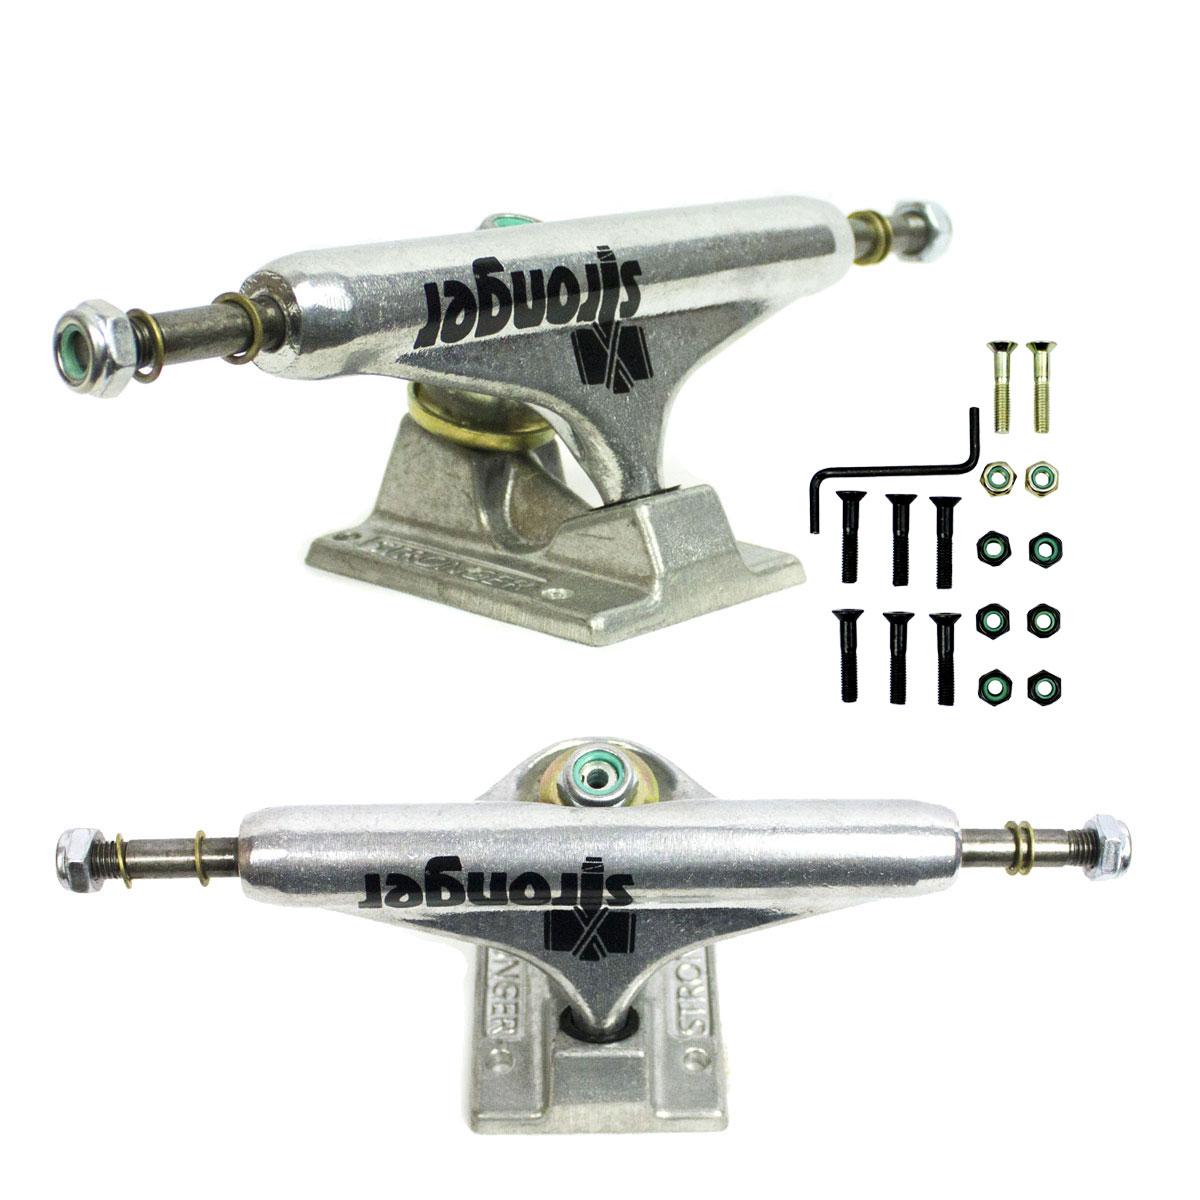 Truck Skate Stronger 149mm Profissional Parafuso de Base P10